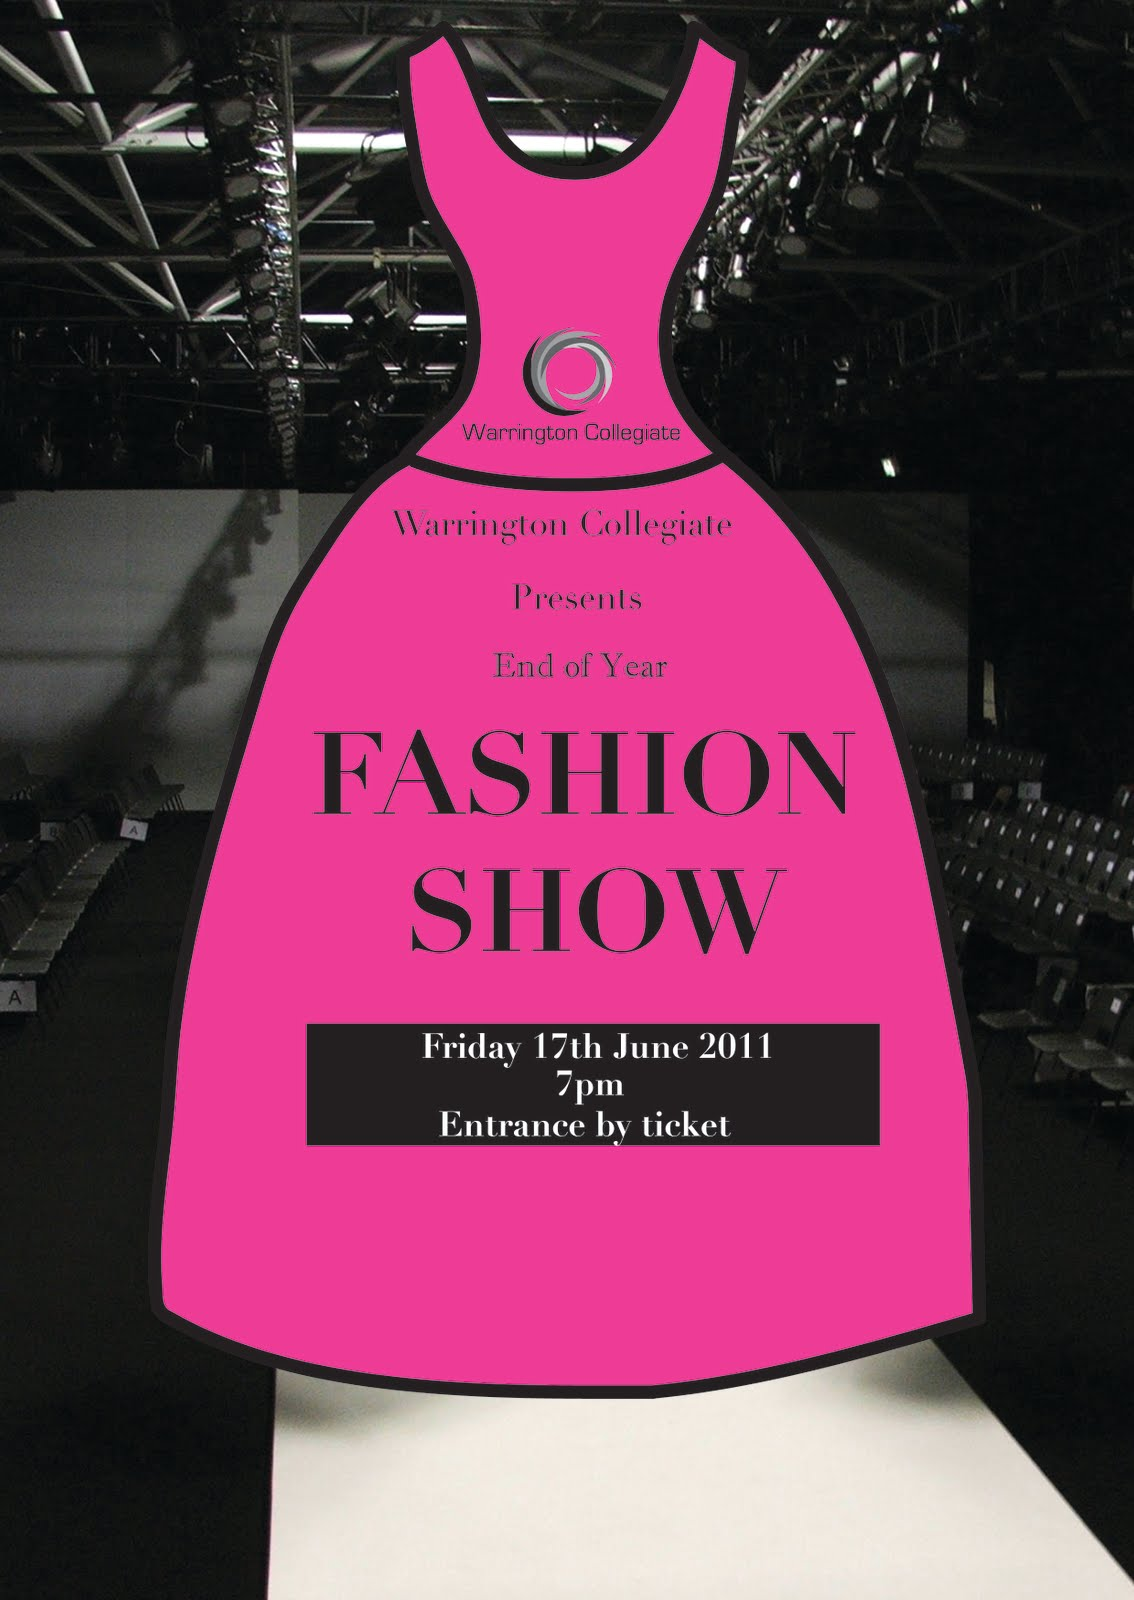 Fashion show flyer templates